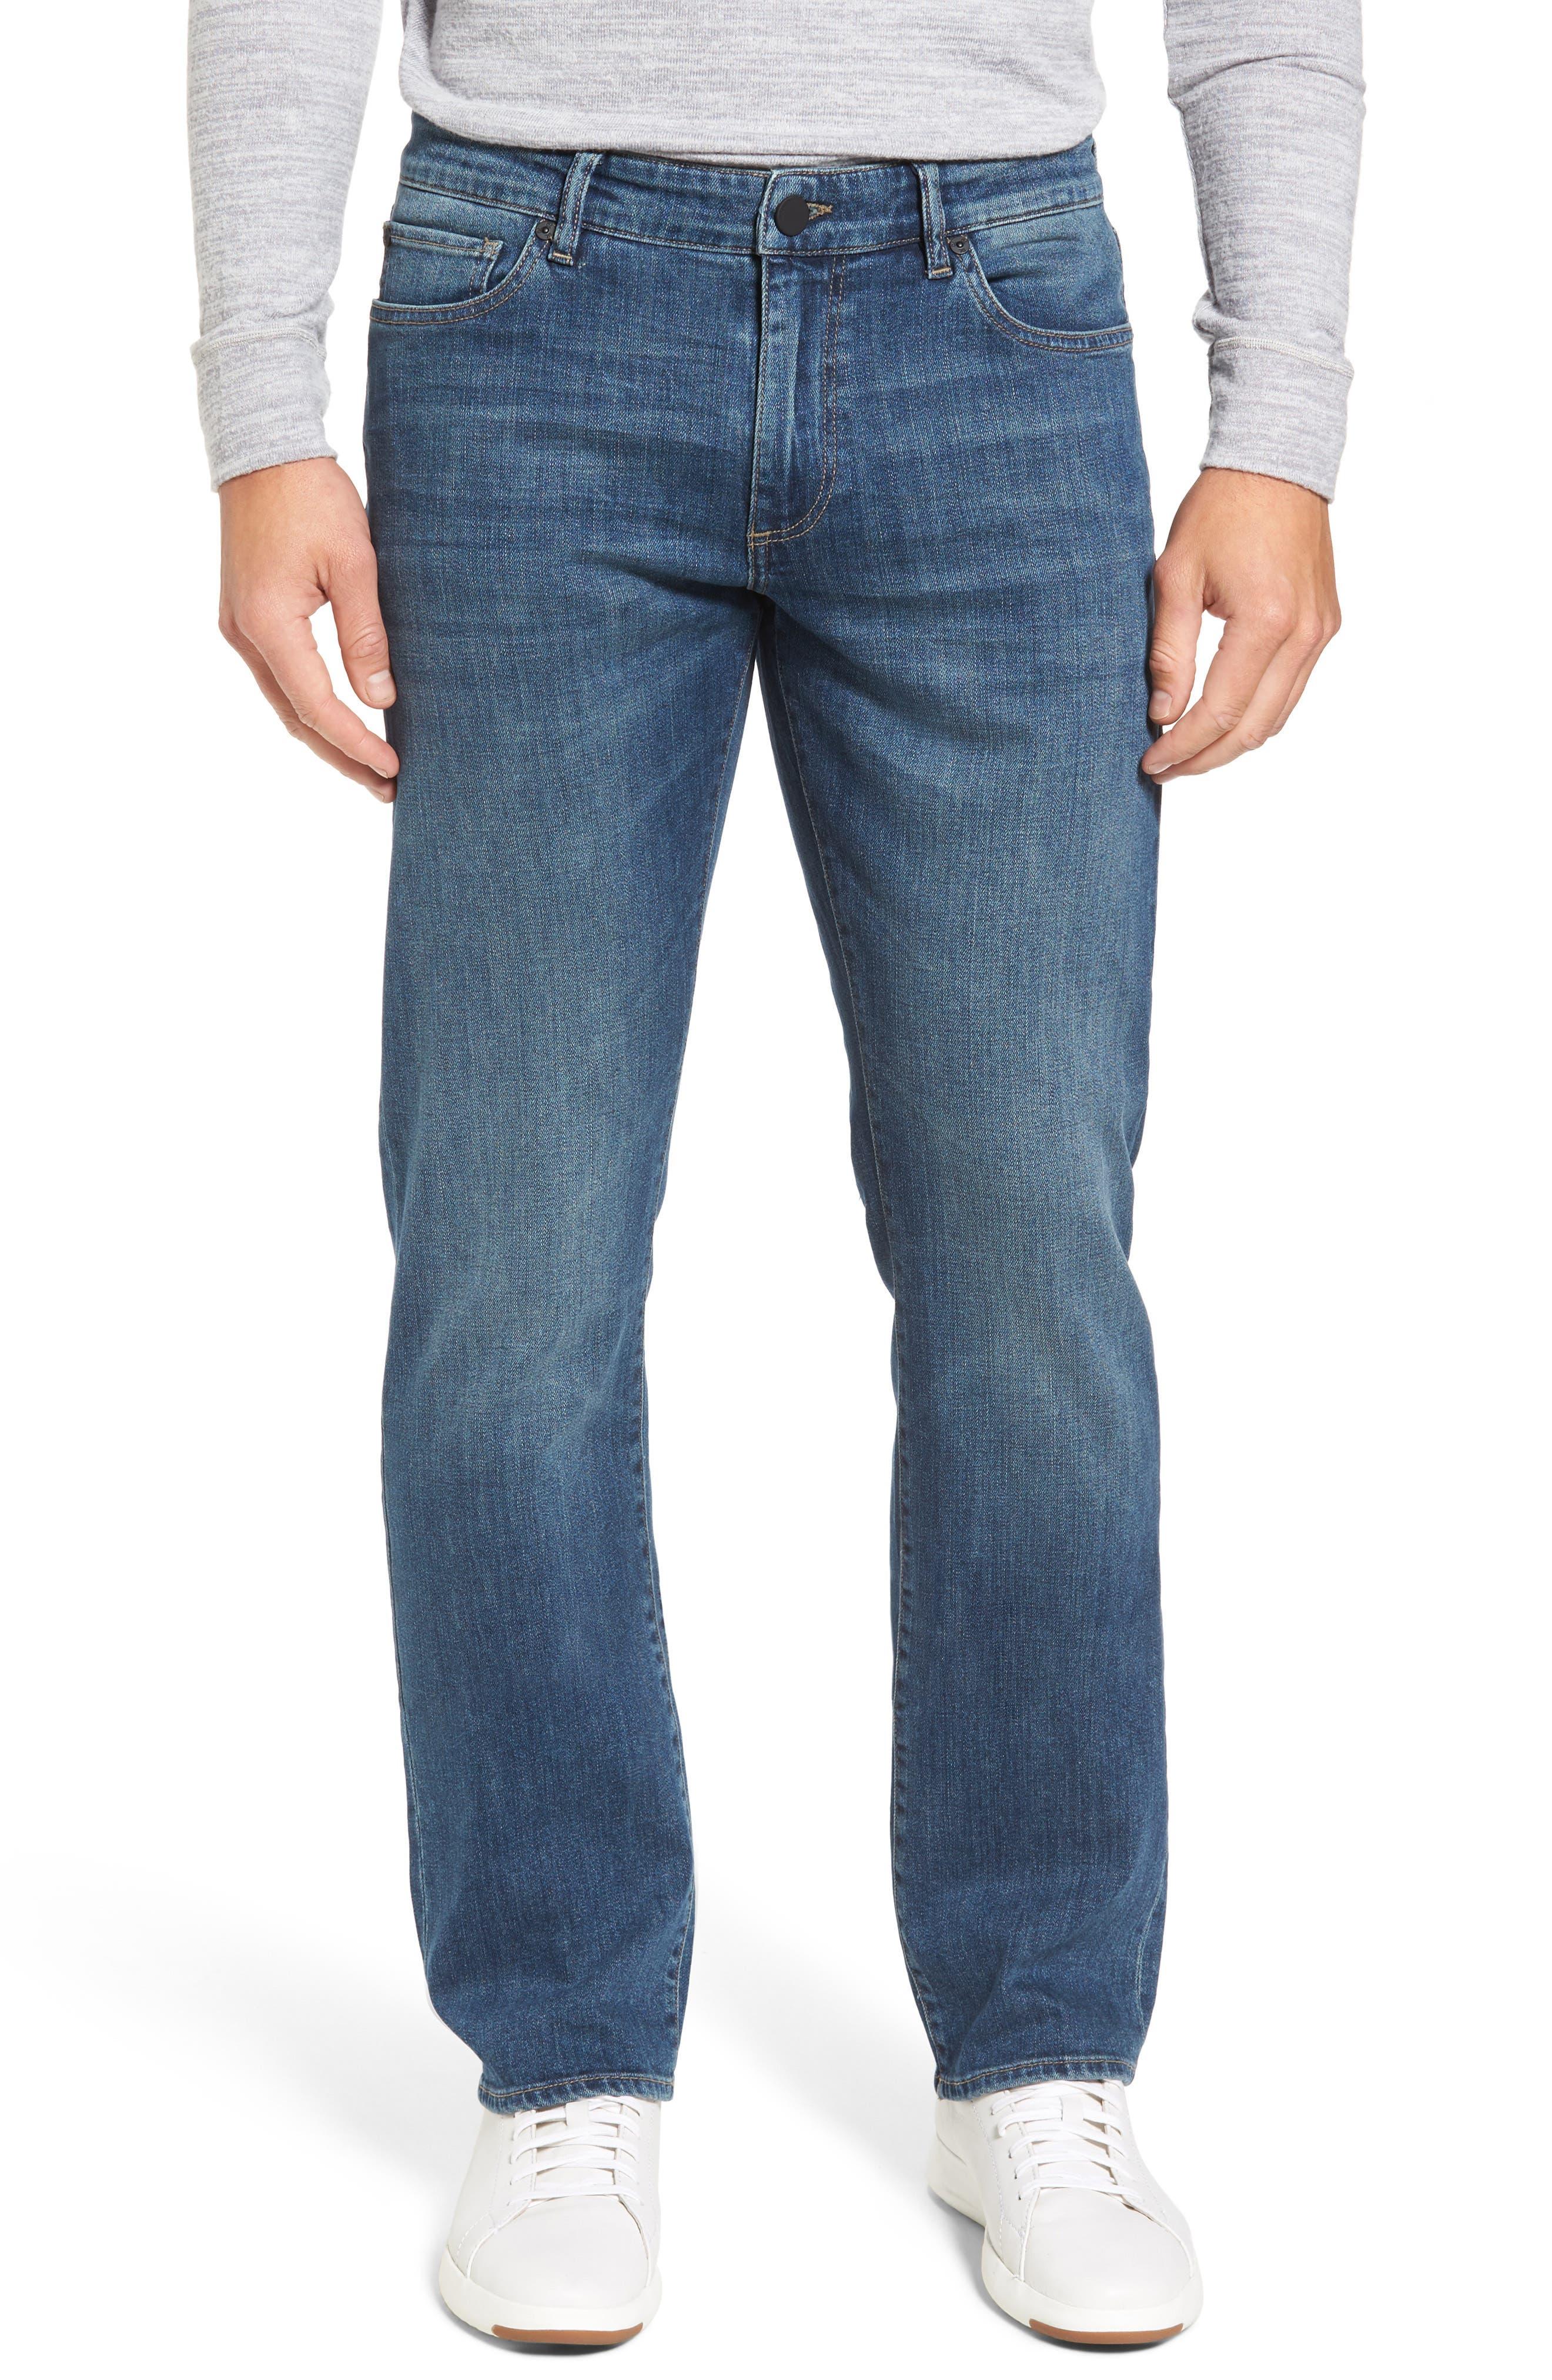 Avery Slim Straight Leg Jeans,                         Main,                         color, Epoxy